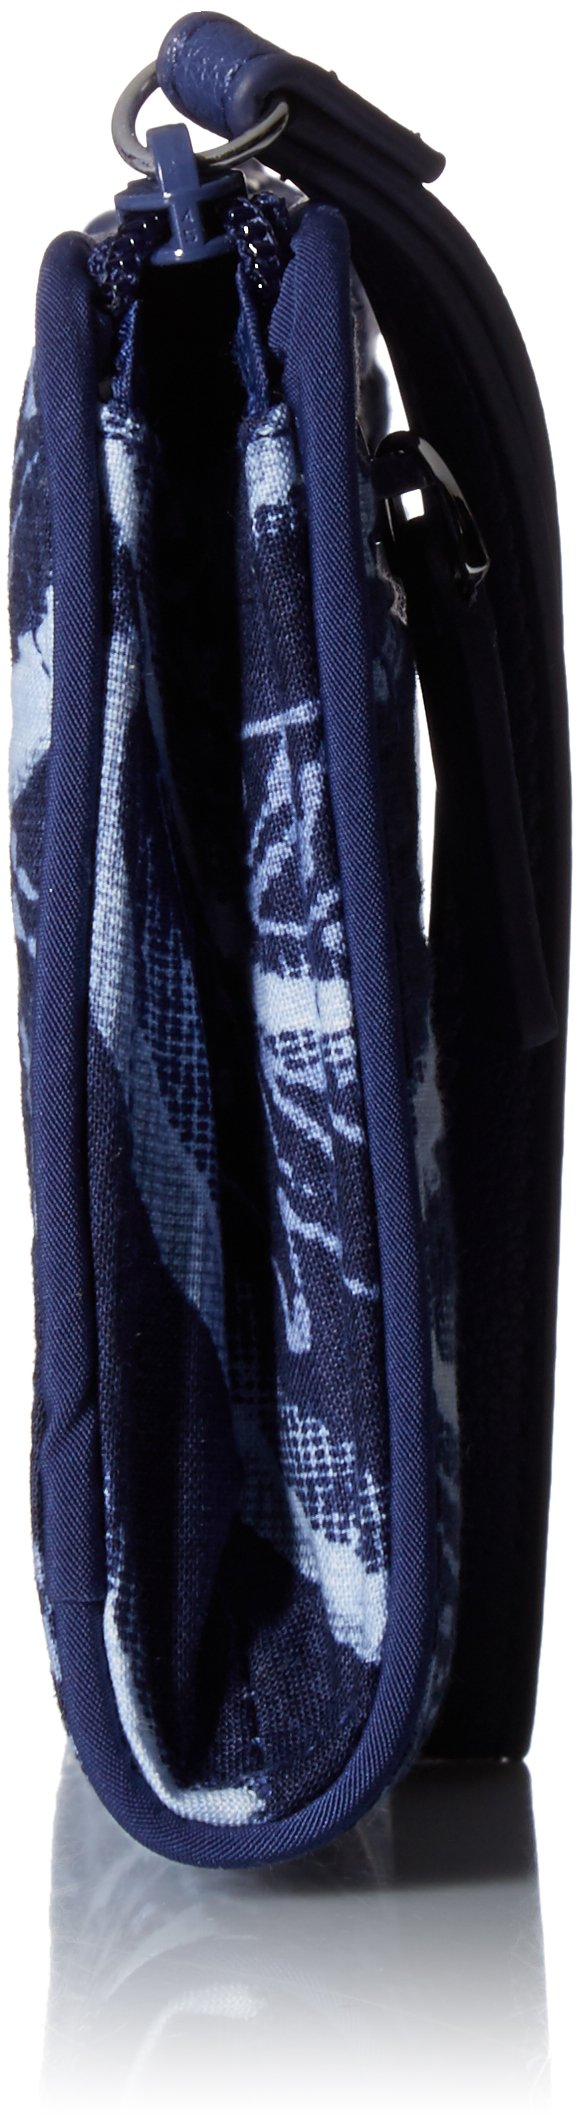 Vera Bradley Rfid Front Zip Wristlet, Signature Cotton,One Size,Indigo by Vera Bradley (Image #3)